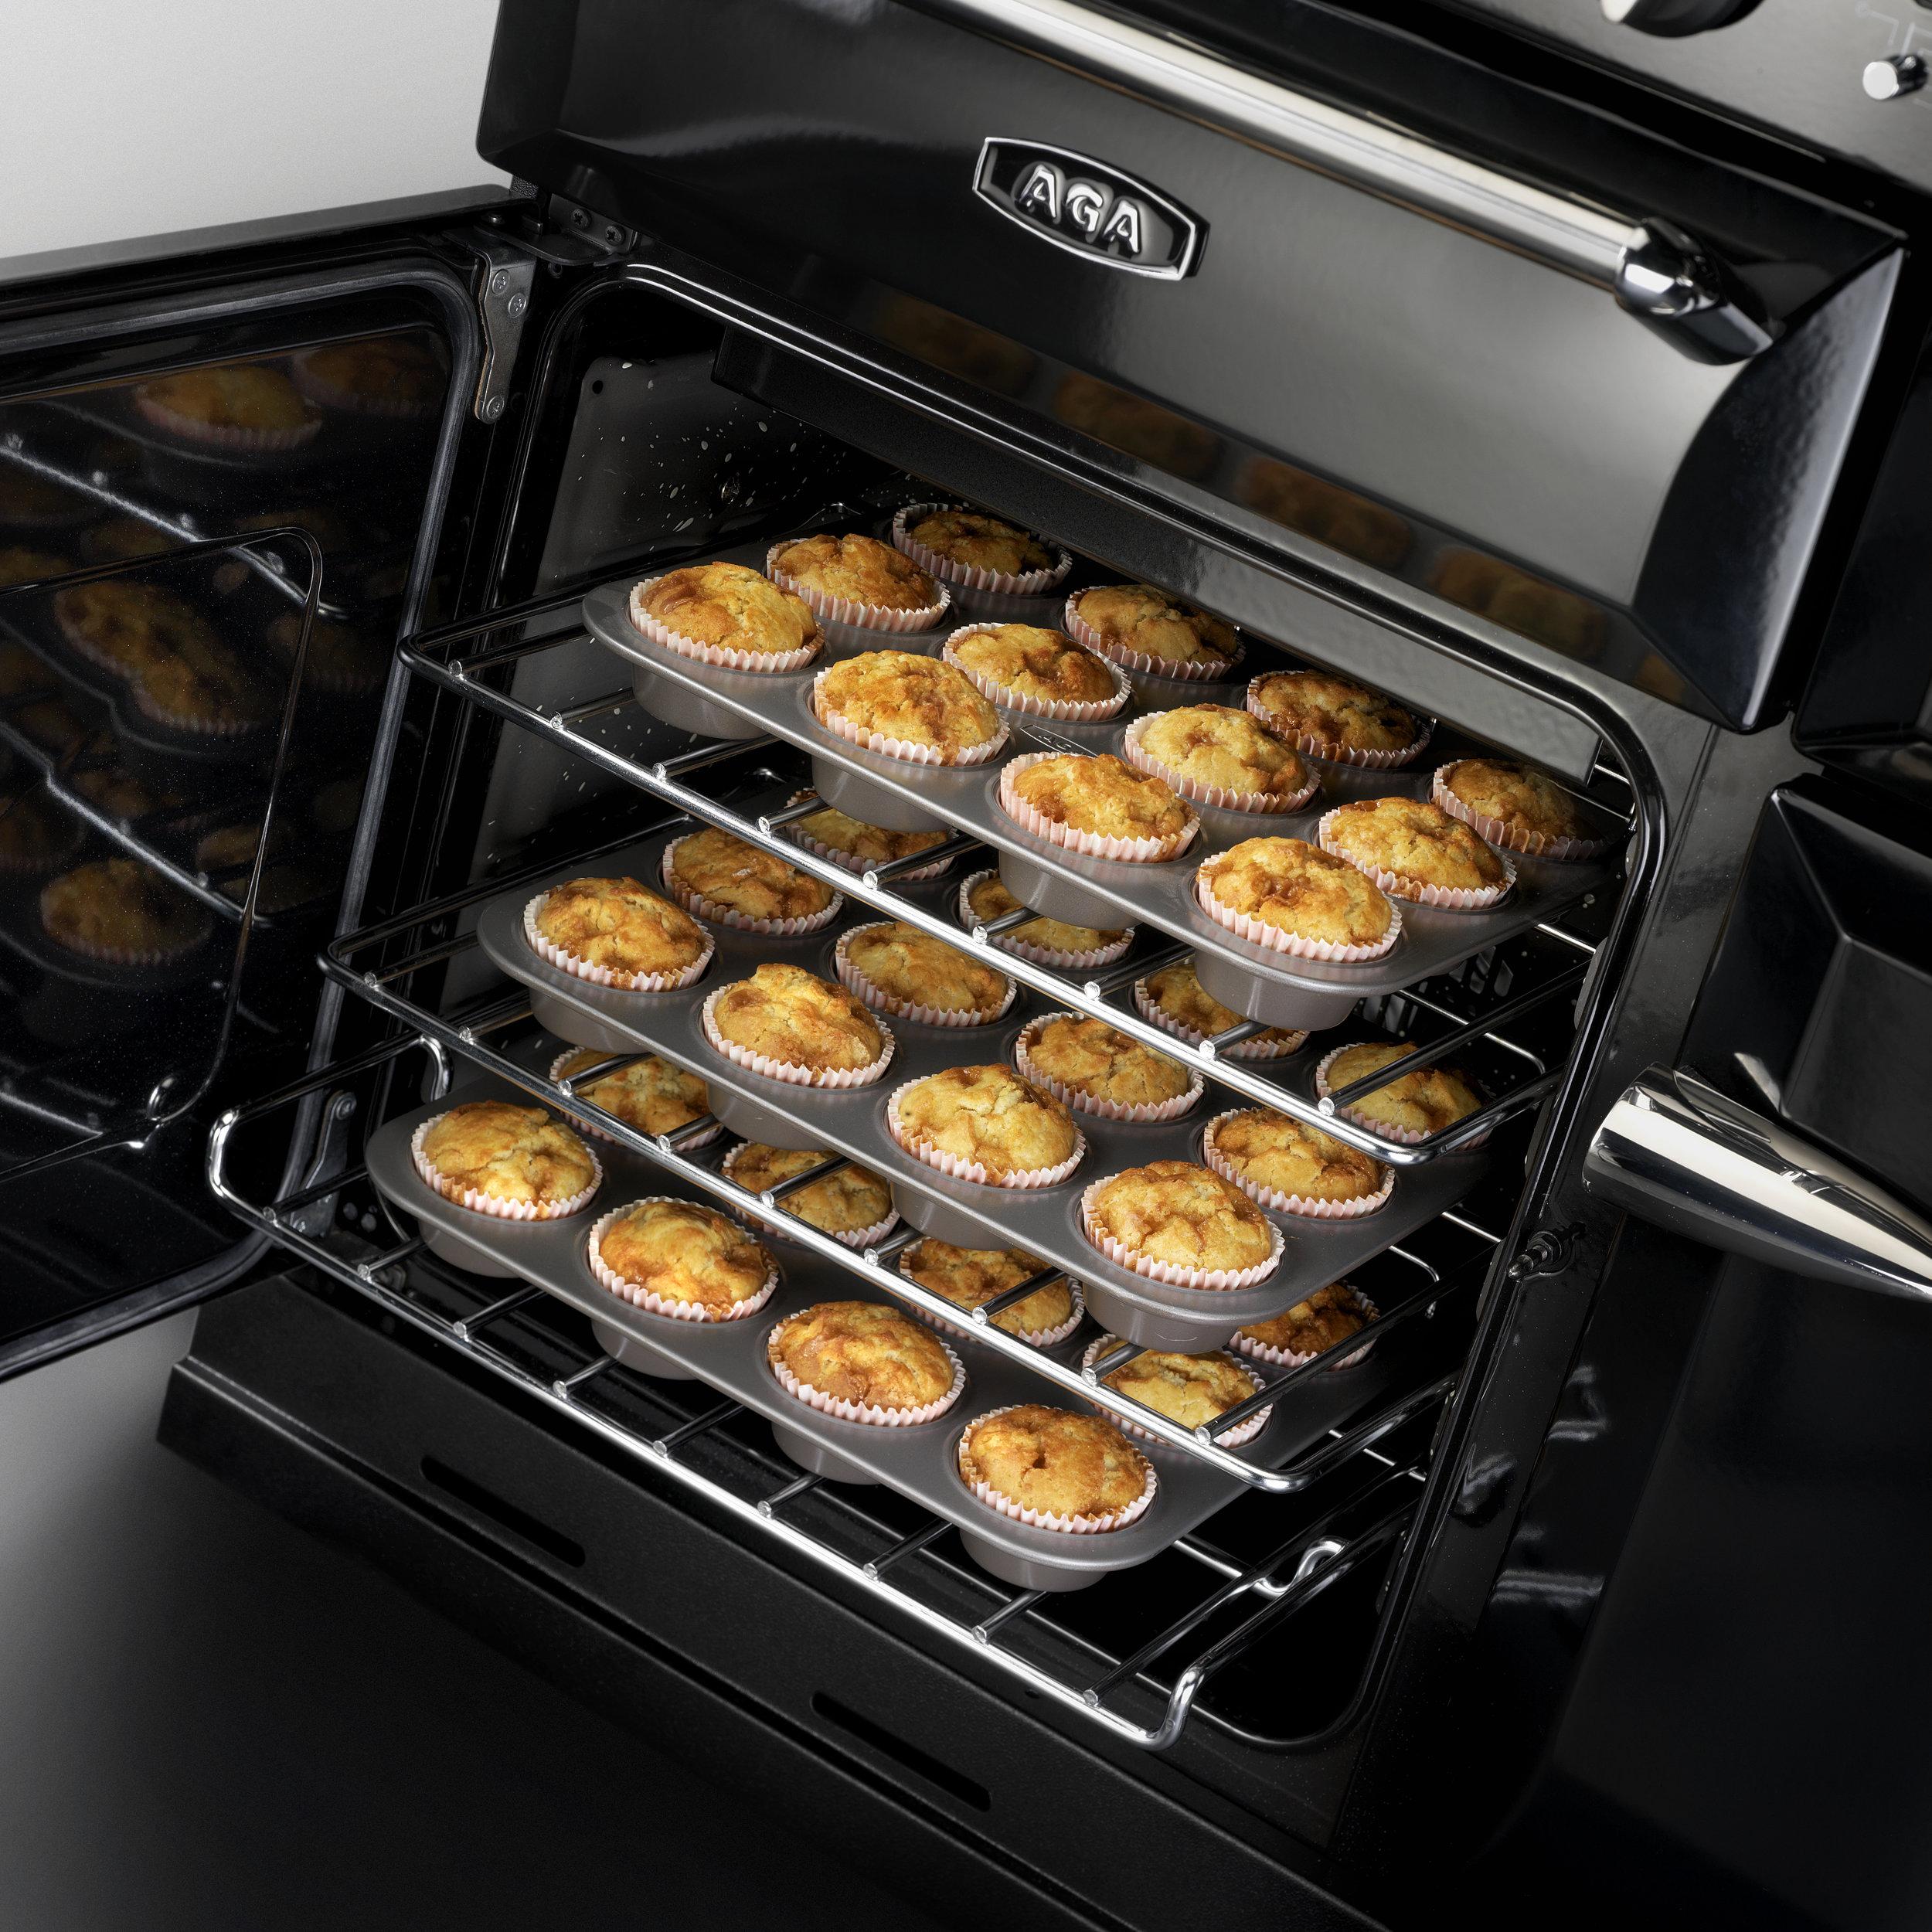 AGA_Masterchef 110_BLACK_Muffins.jpg